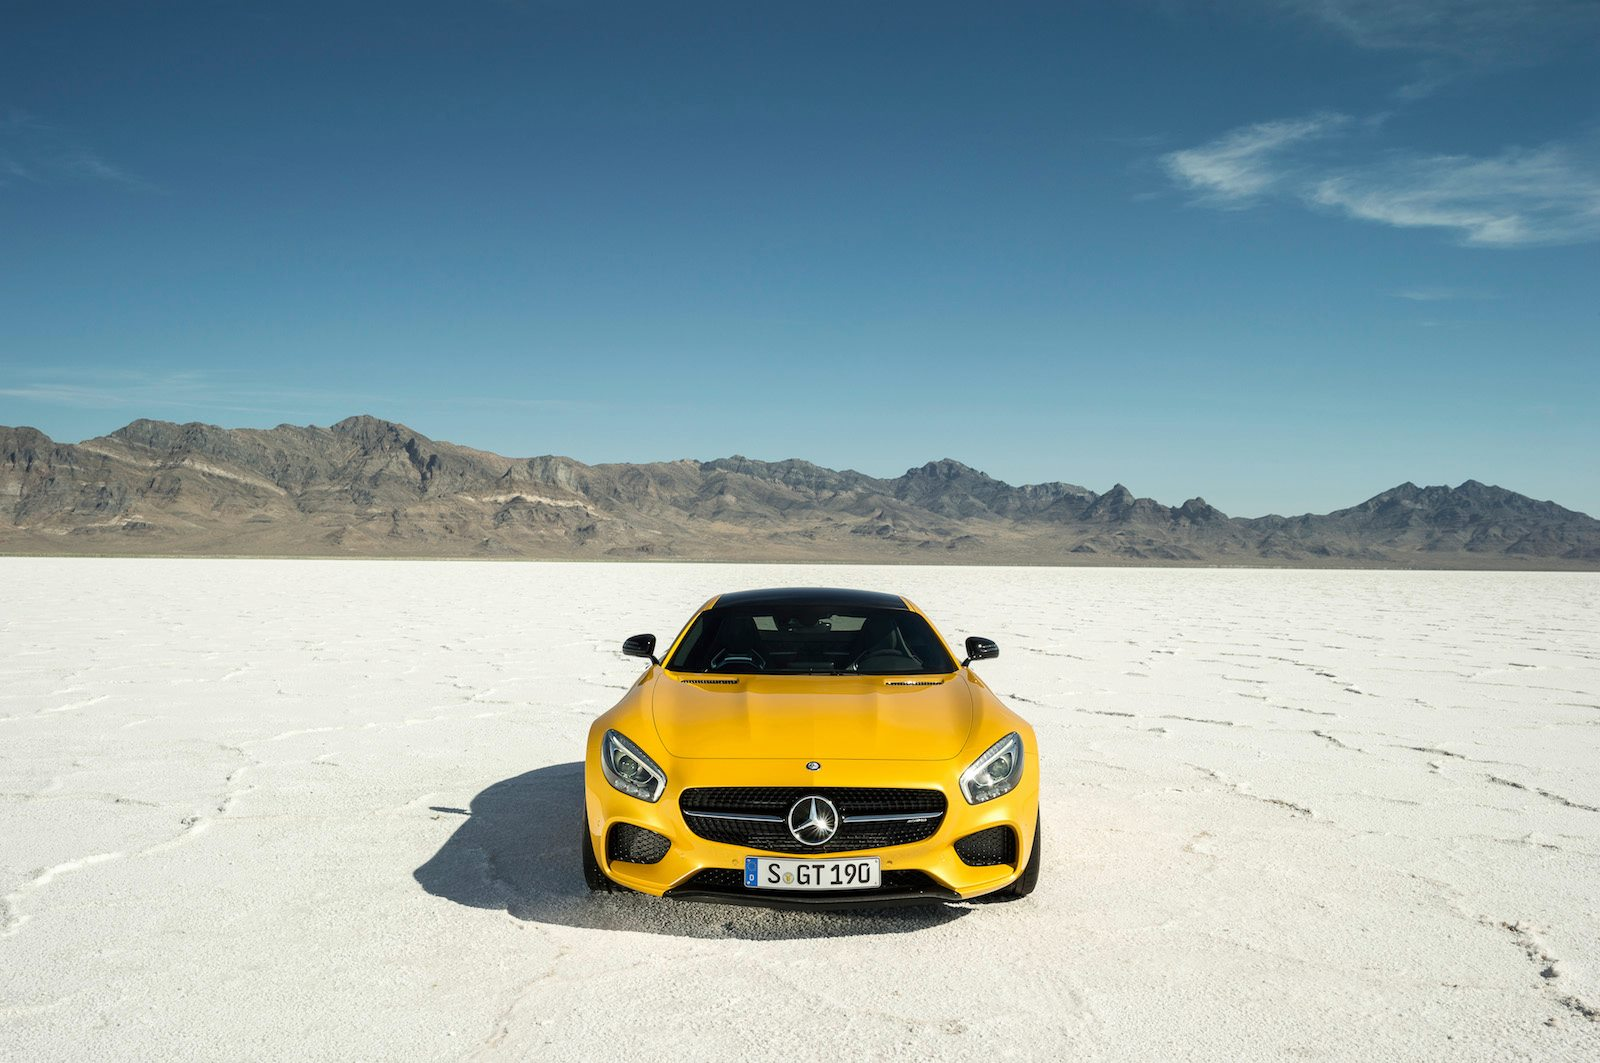 AMG GT  New Mercedes-Benz AMG GT  1497879 10152714627831670 4733109254196202407 o